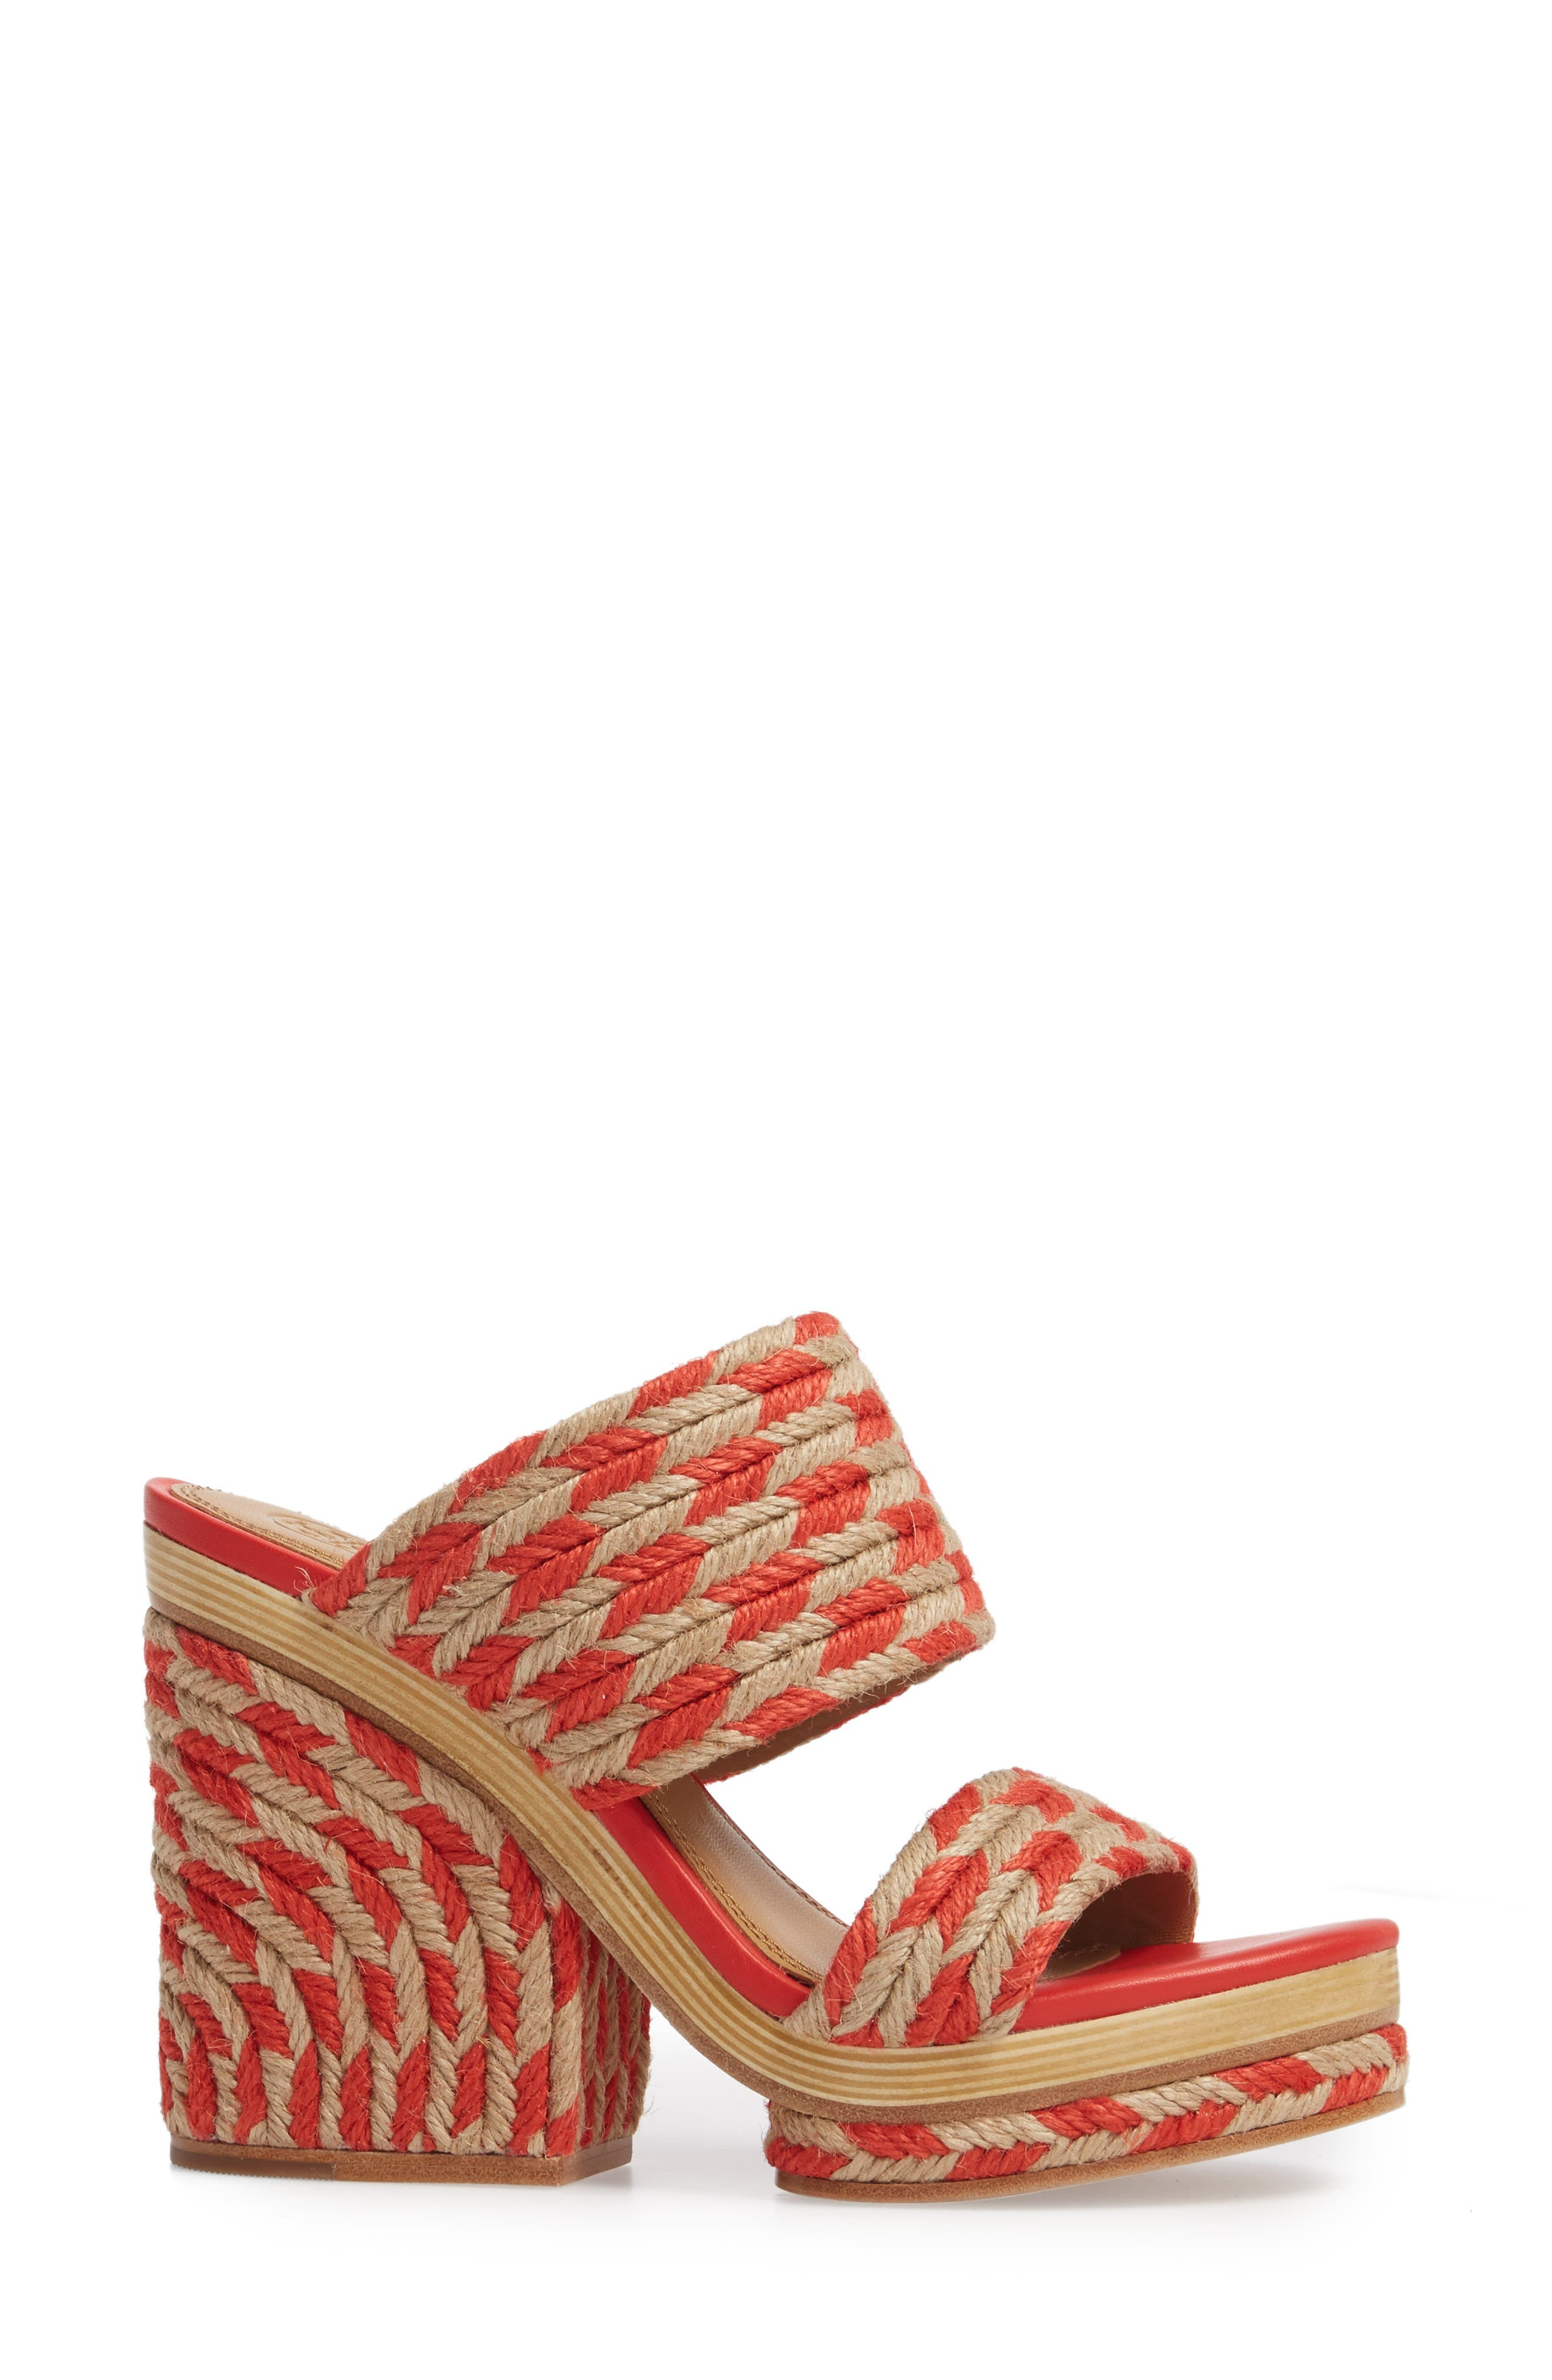 Lola Woven Platform Sandal,                             Alternate thumbnail 3, color,                             Poppy Orange/ Perfect Ivory